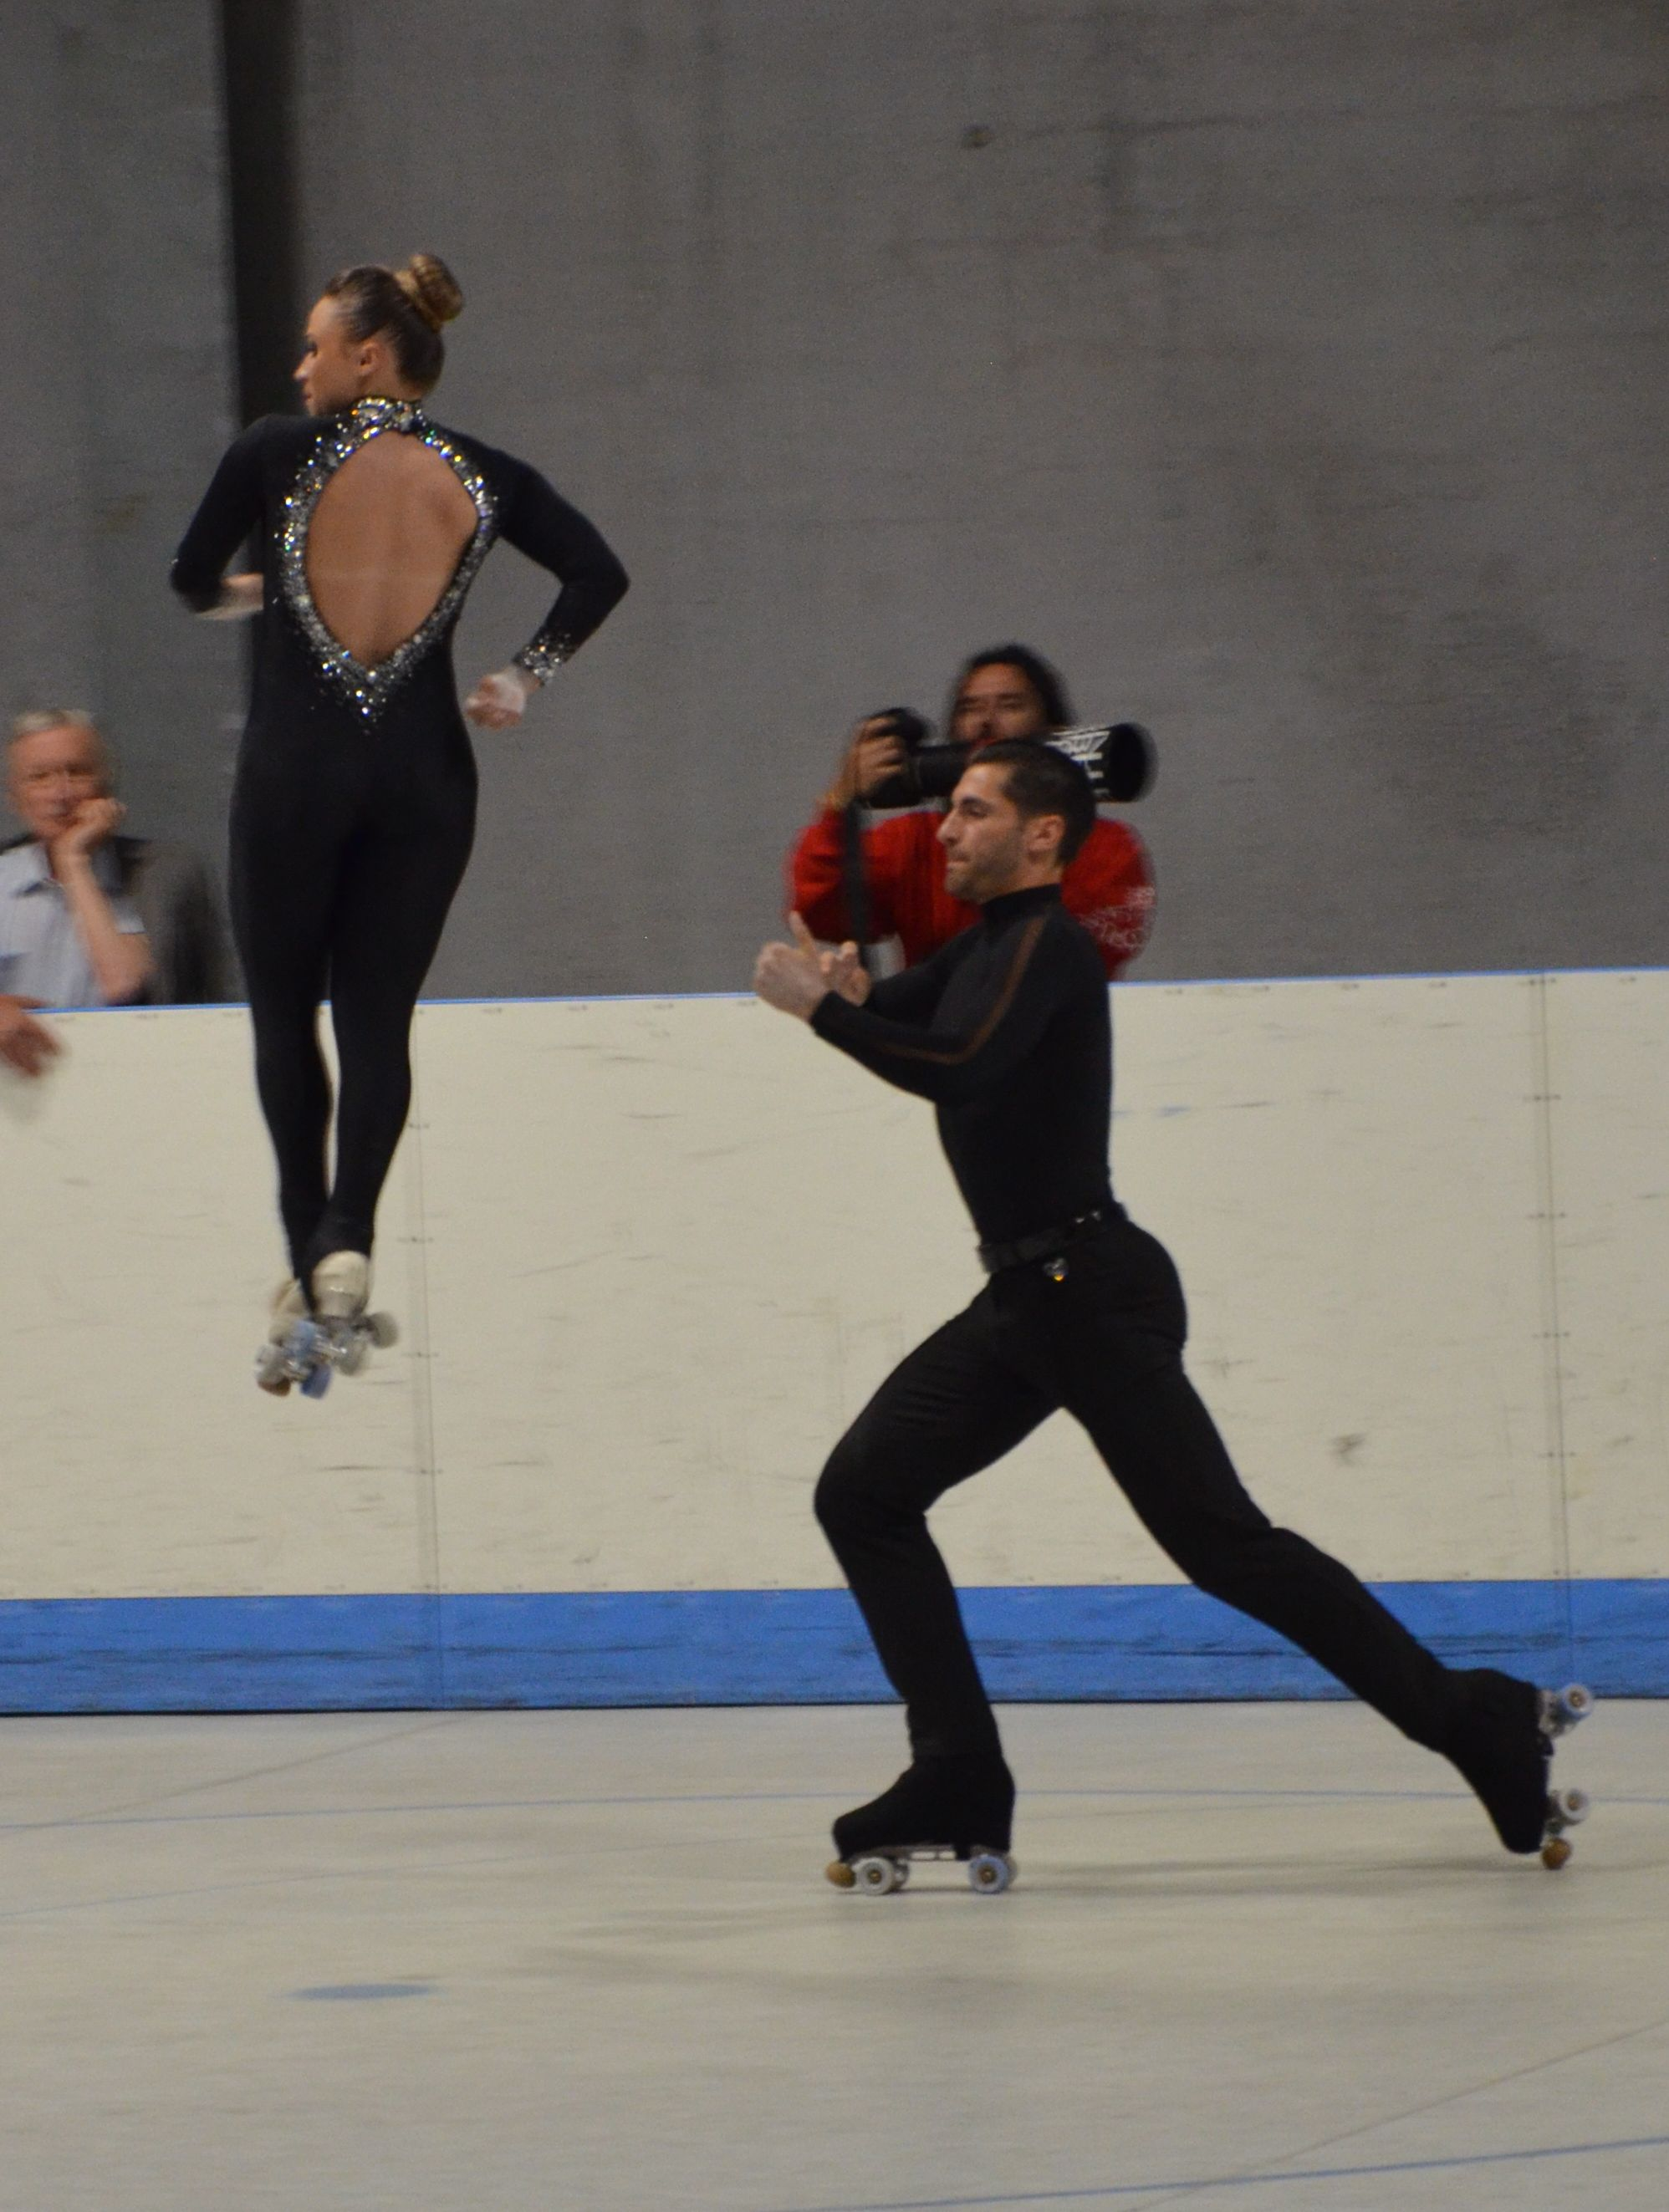 Rebecca Tarlazzi und Luca Lucaroni